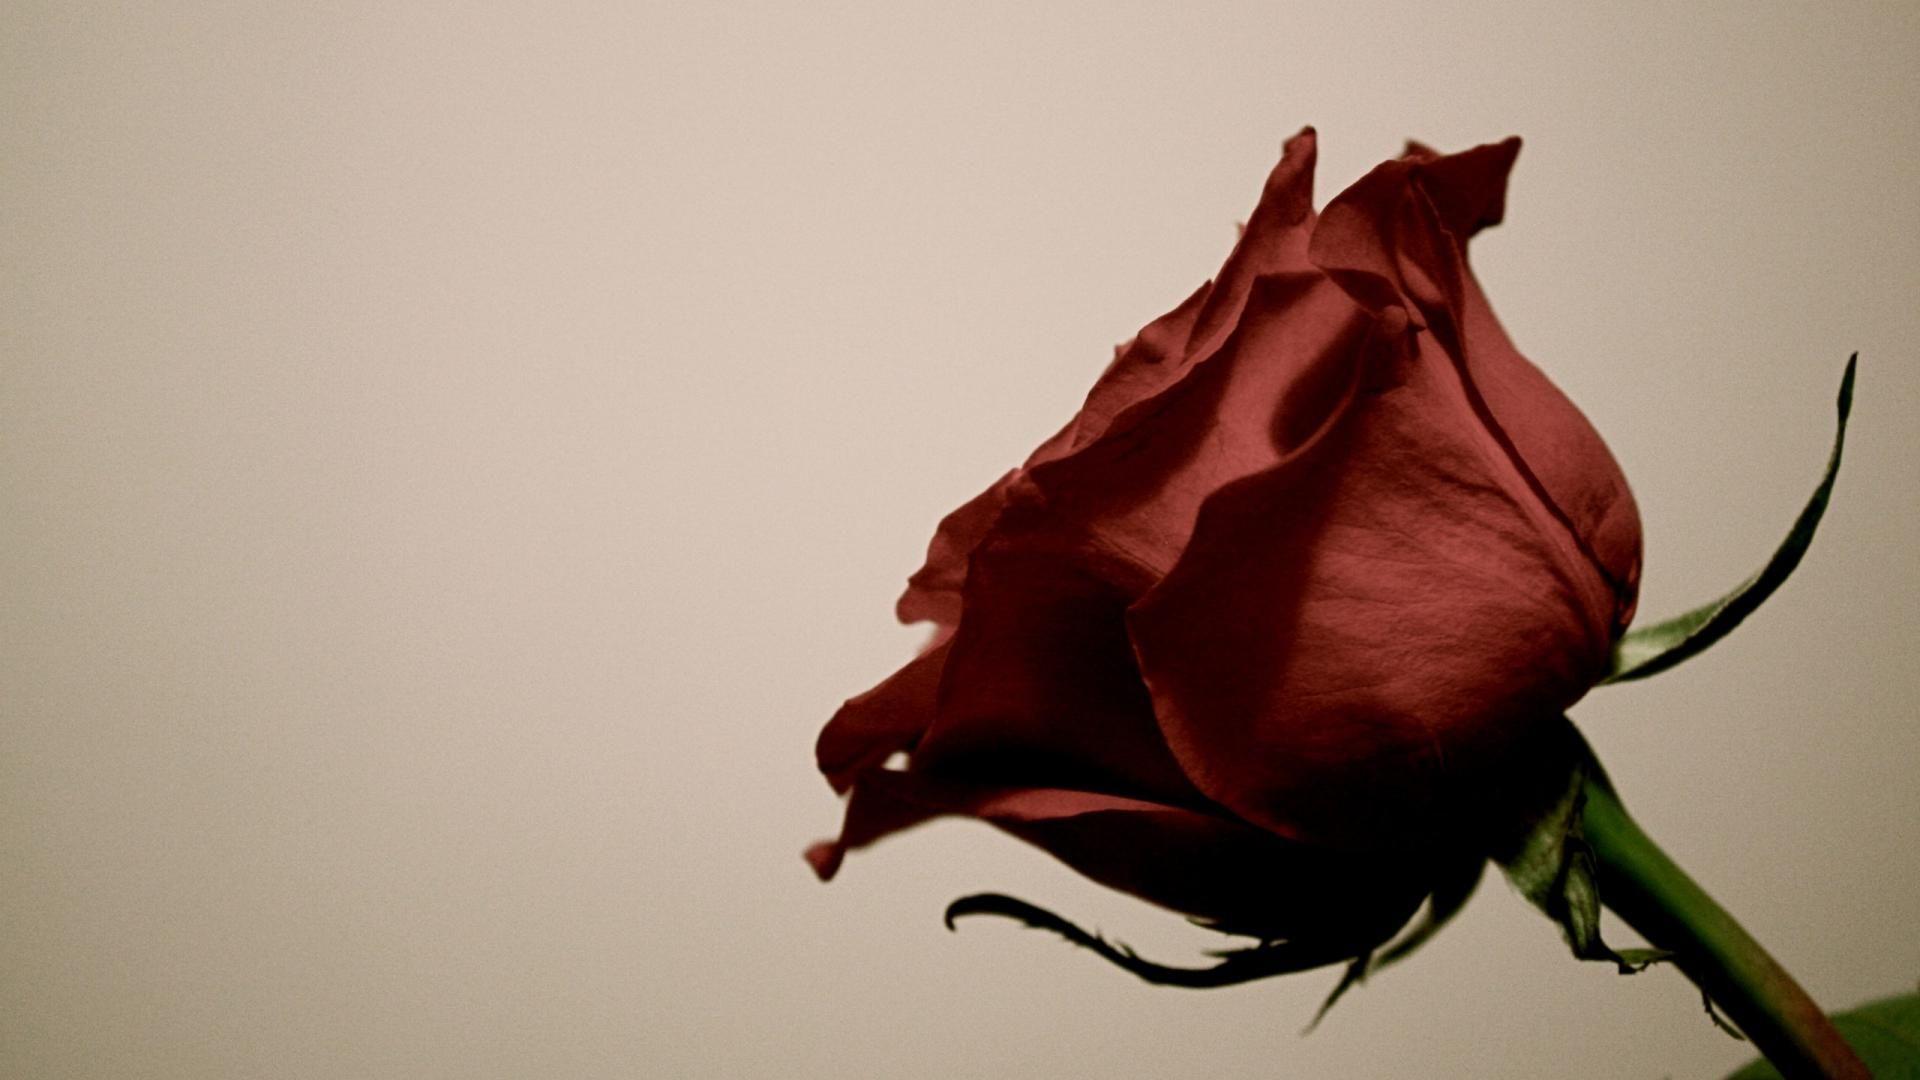 Red Rose Flower Desktop Hd Wallpaper Facebook Covers Phone